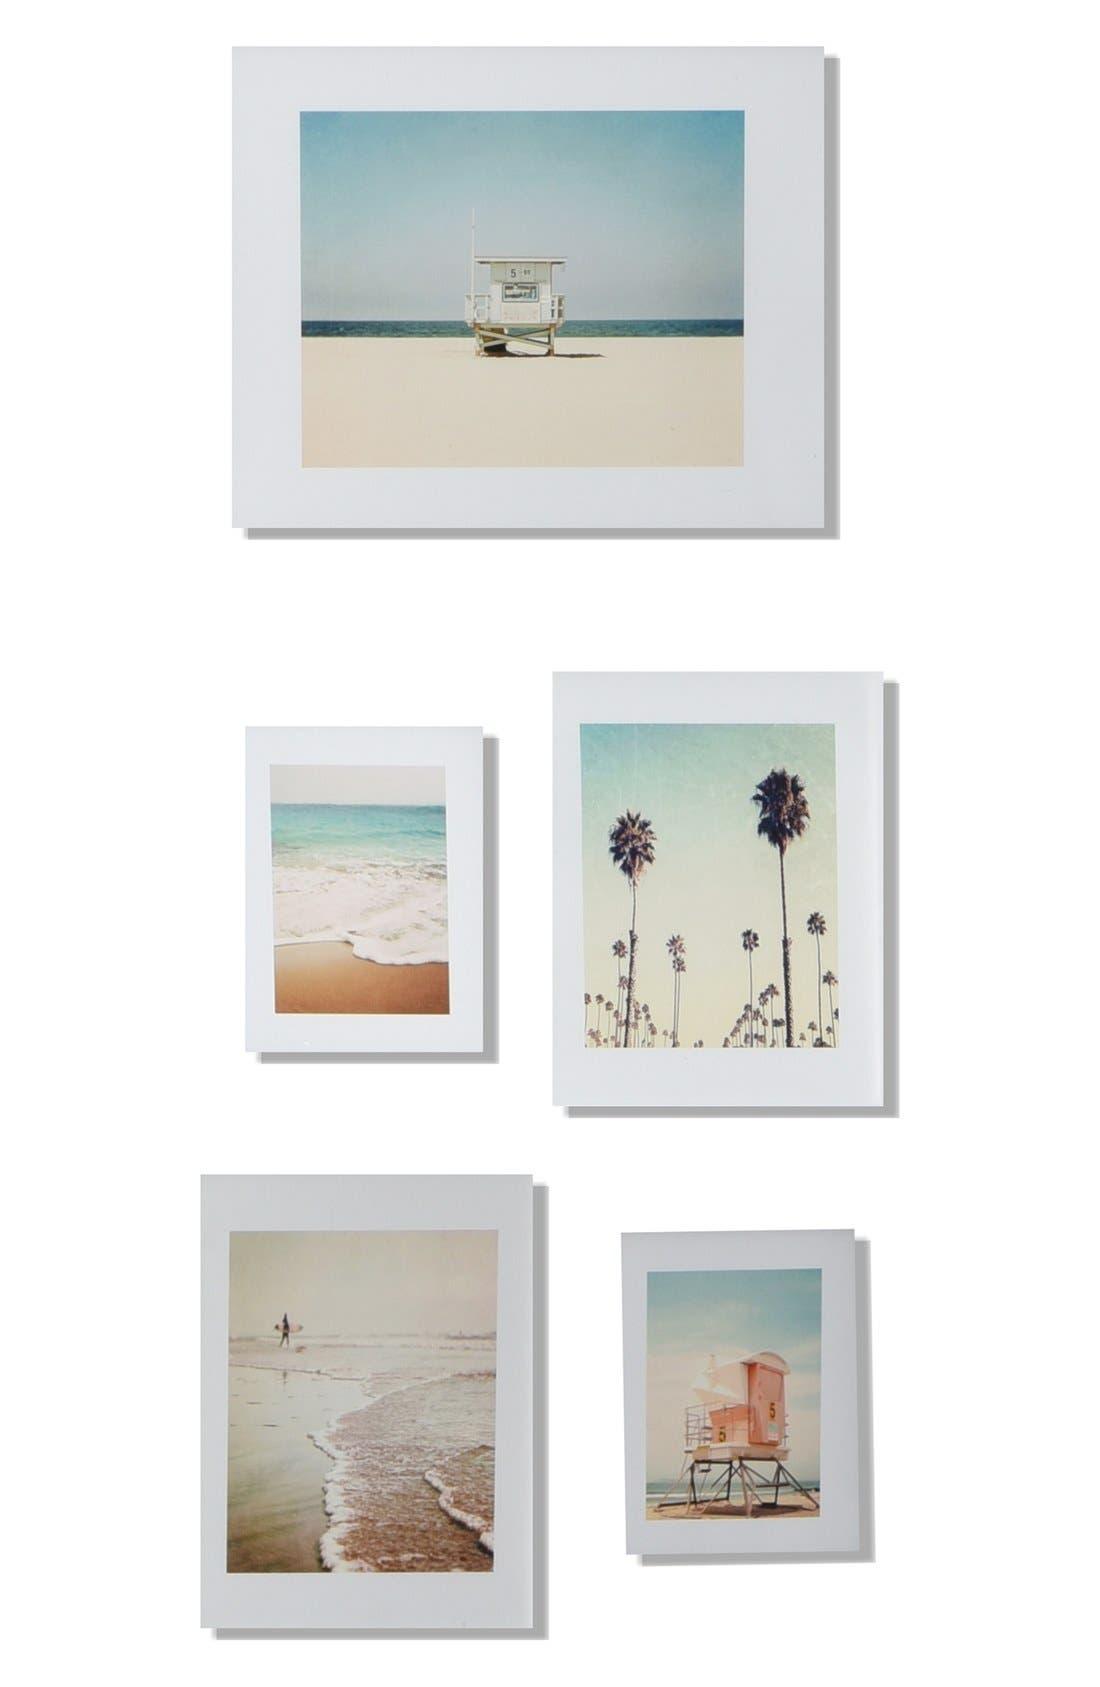 Deny Designs '5th Street' Wall Art Print Set (Set of 5)